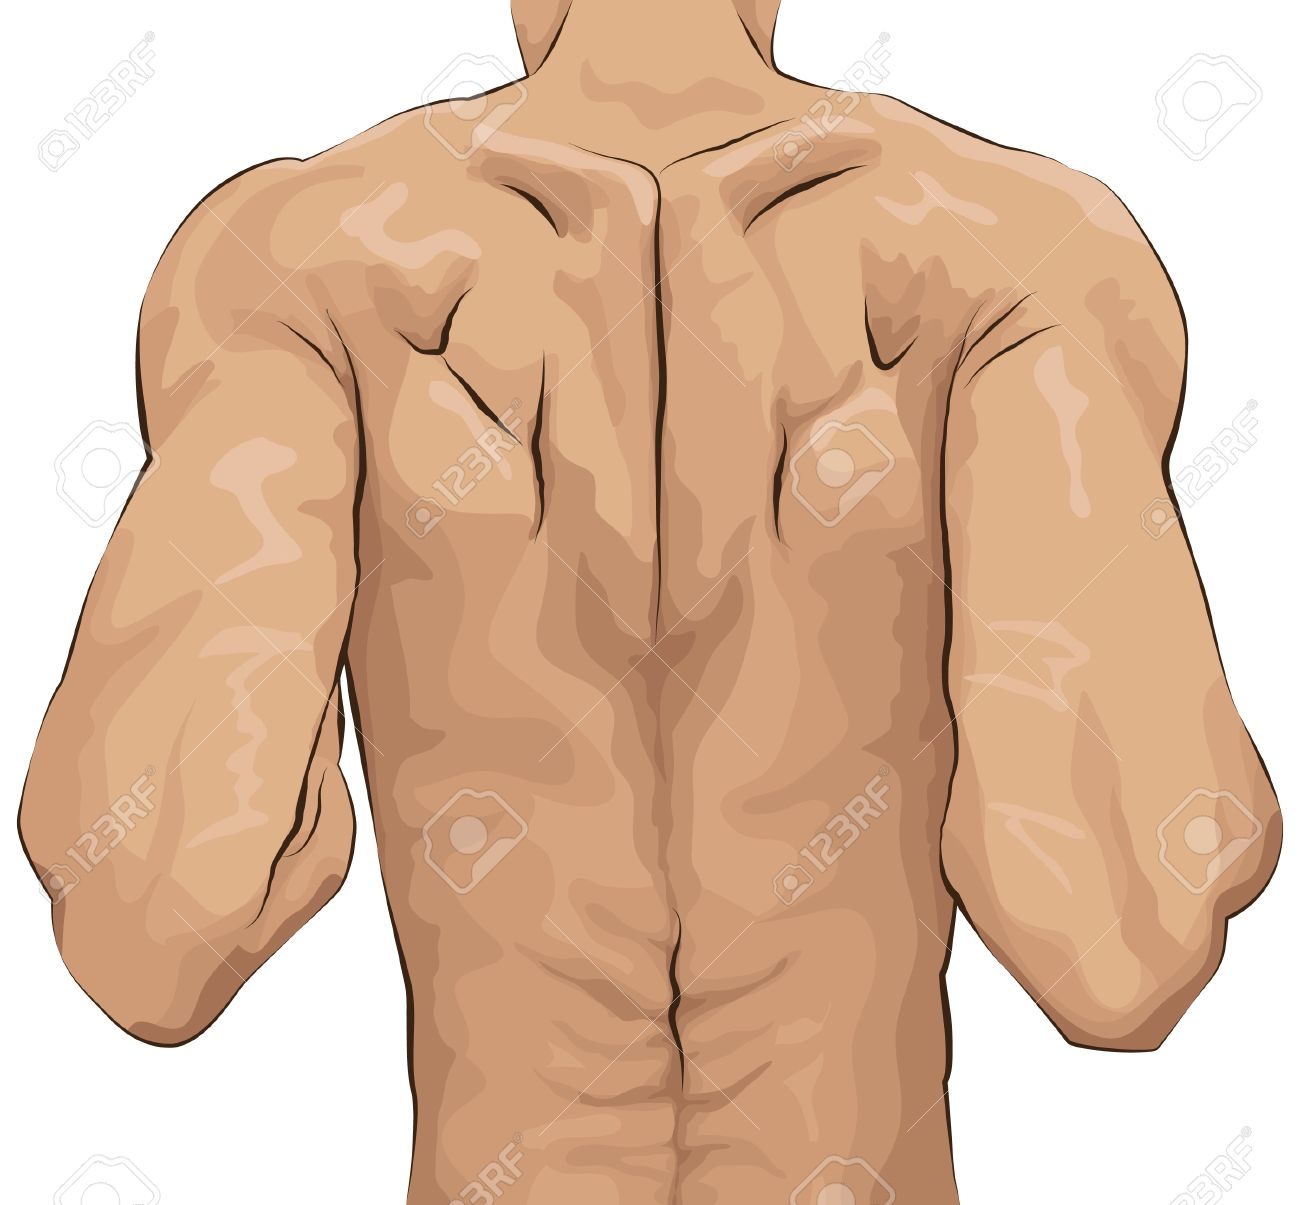 Back Muscles Clip Art.